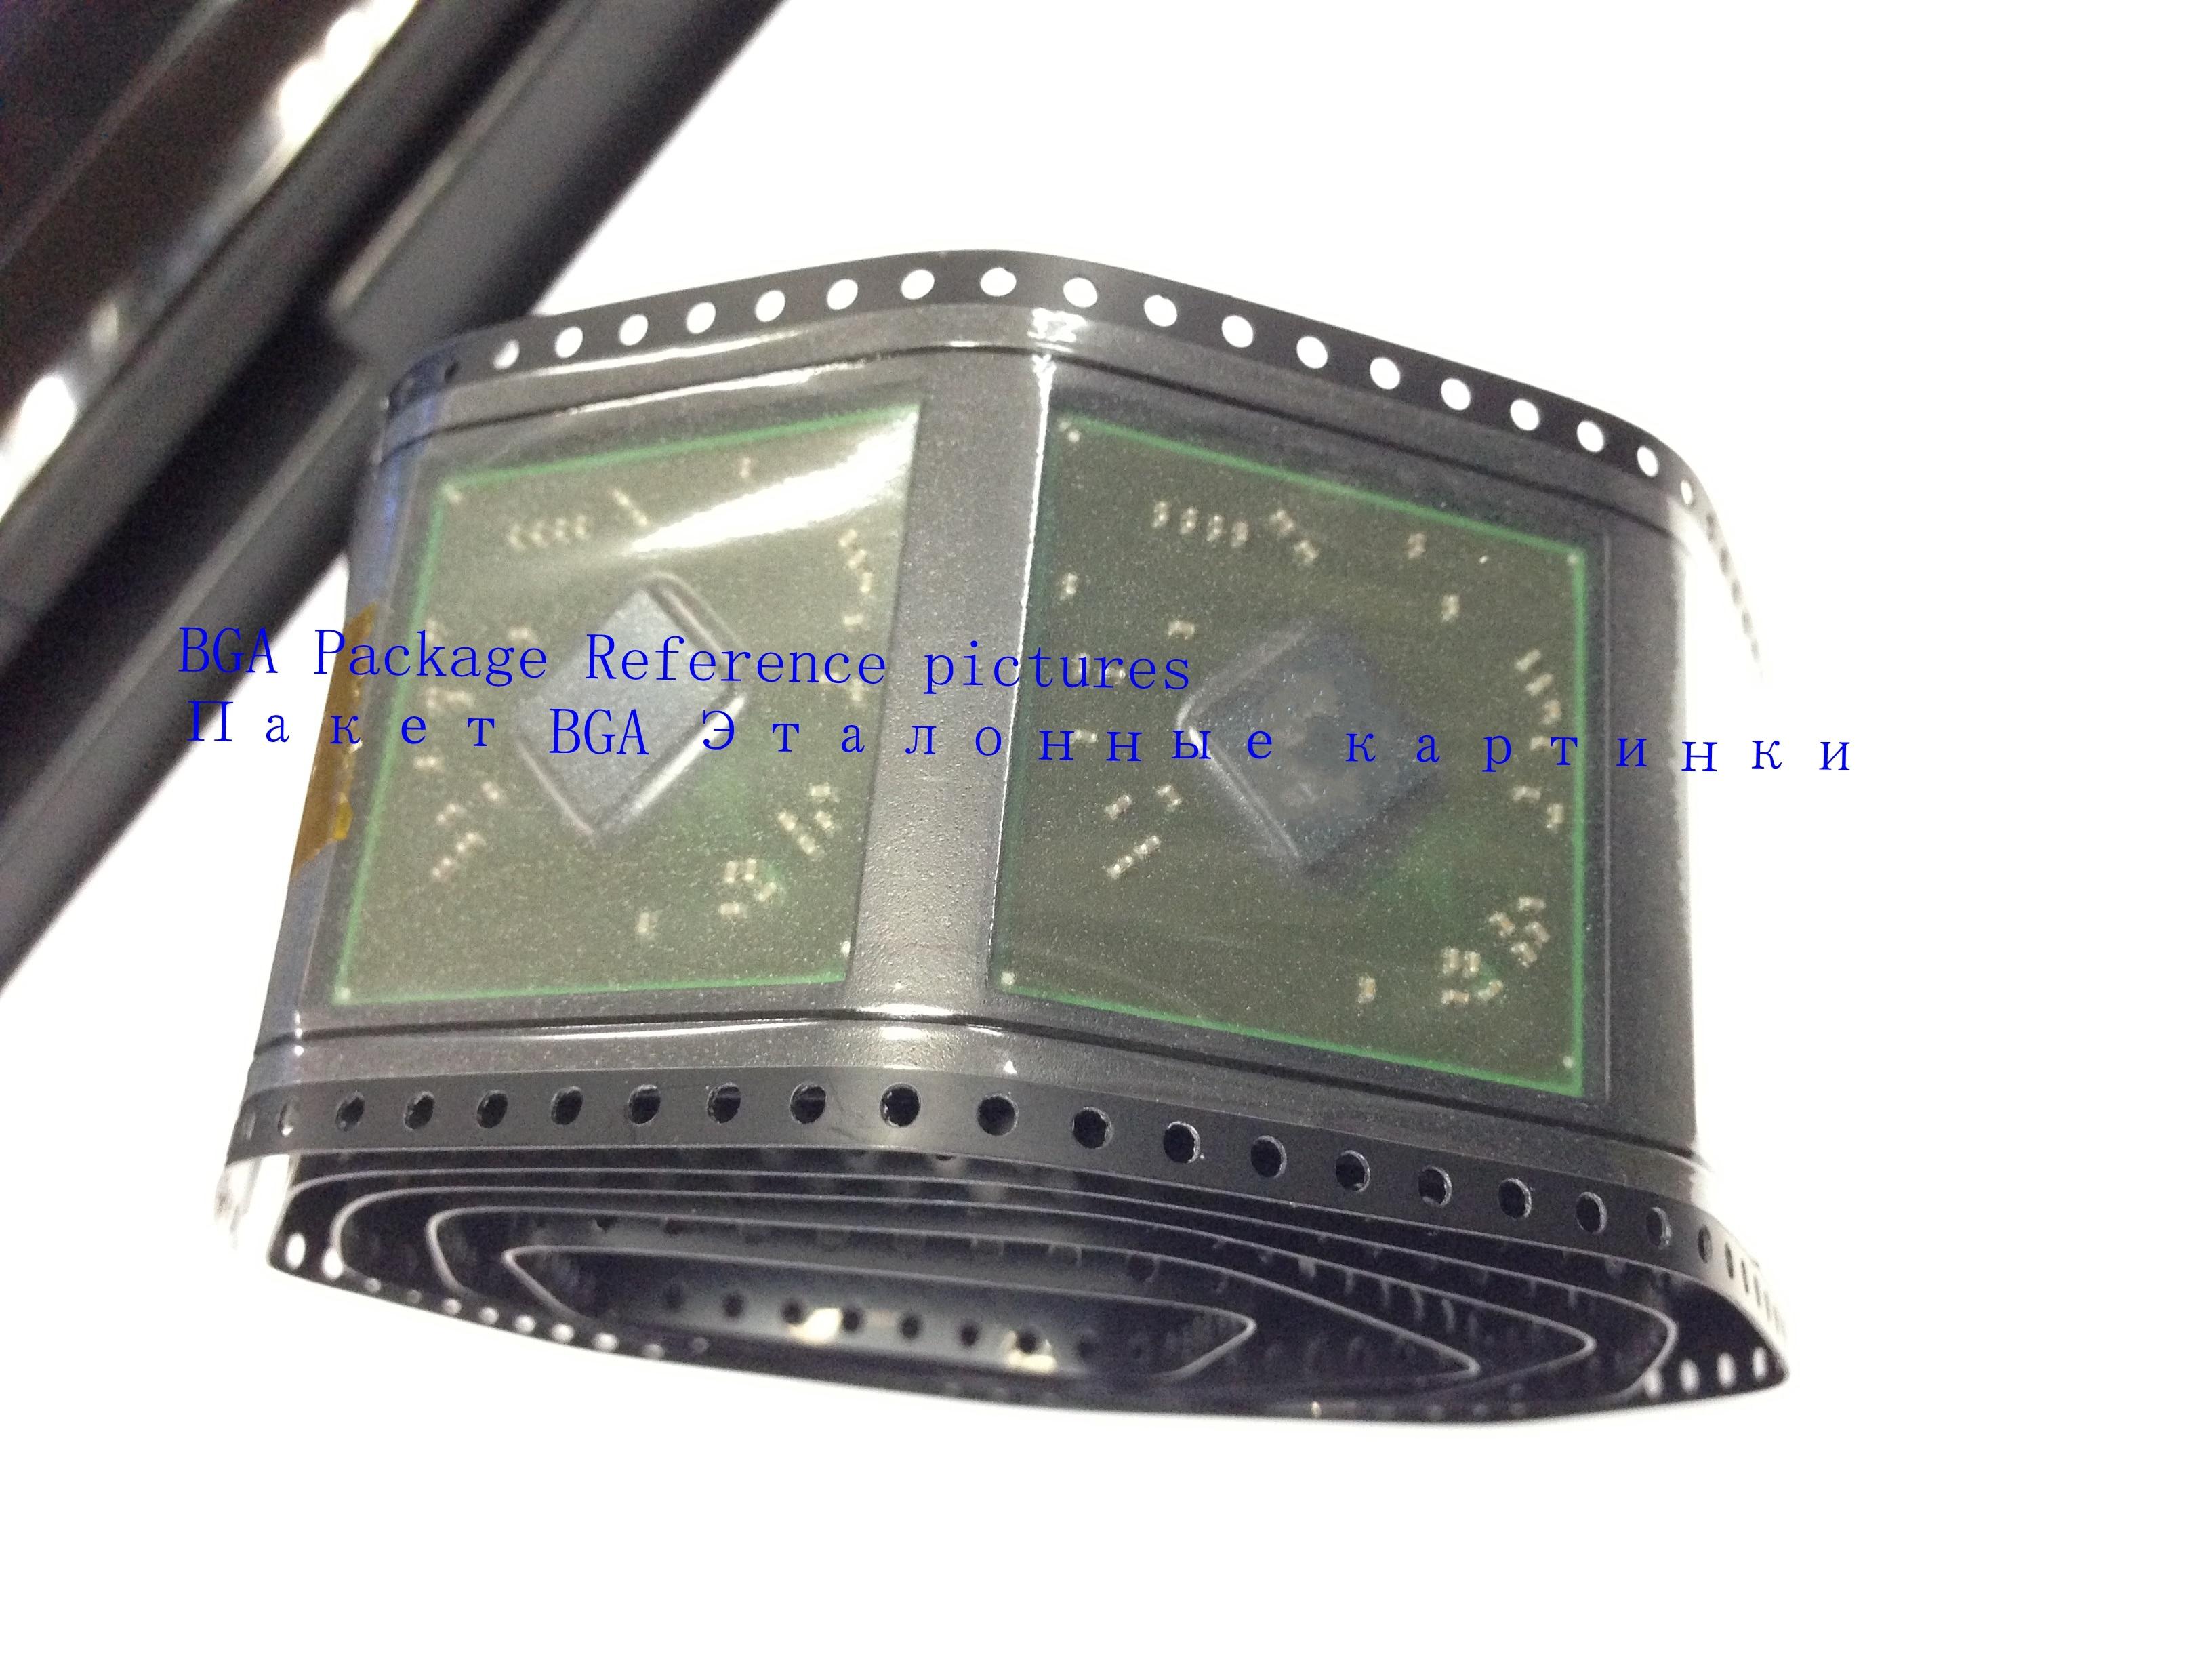 1pcs/lot 100% New N11P-GE1-A3 N11P GE1 A3 128Bit 256MB BGA Chipset1pcs/lot 100% New N11P-GE1-A3 N11P GE1 A3 128Bit 256MB BGA Chipset